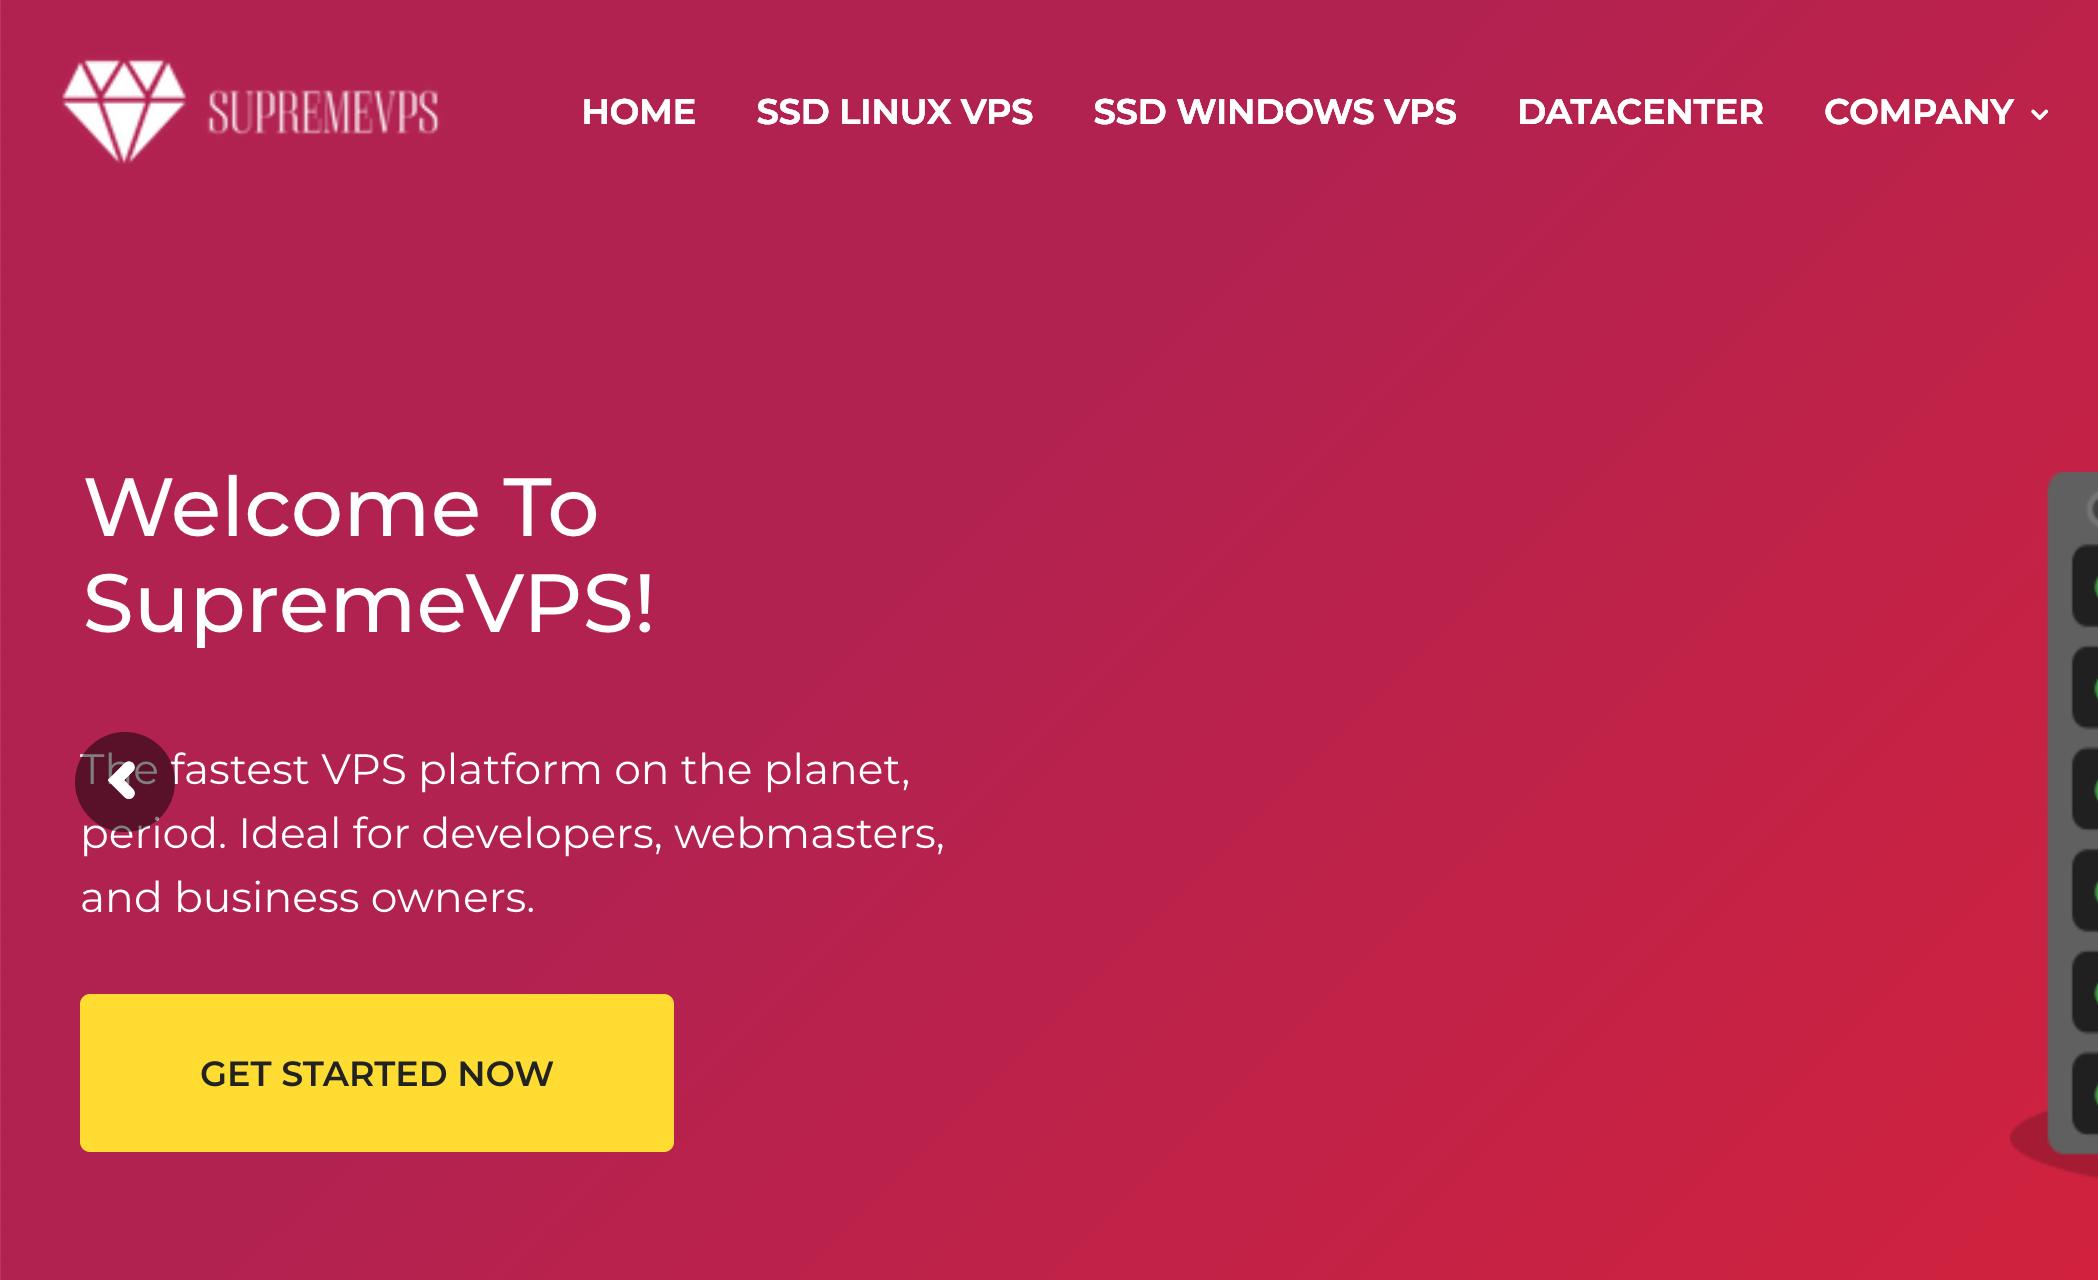 支持支付宝、微信支付的VPS - SupremeVPS Linux Windows年付29美元起,KVM 虚拟化,洛杉矶、水牛城年付VPS,SupremeVPS优惠码